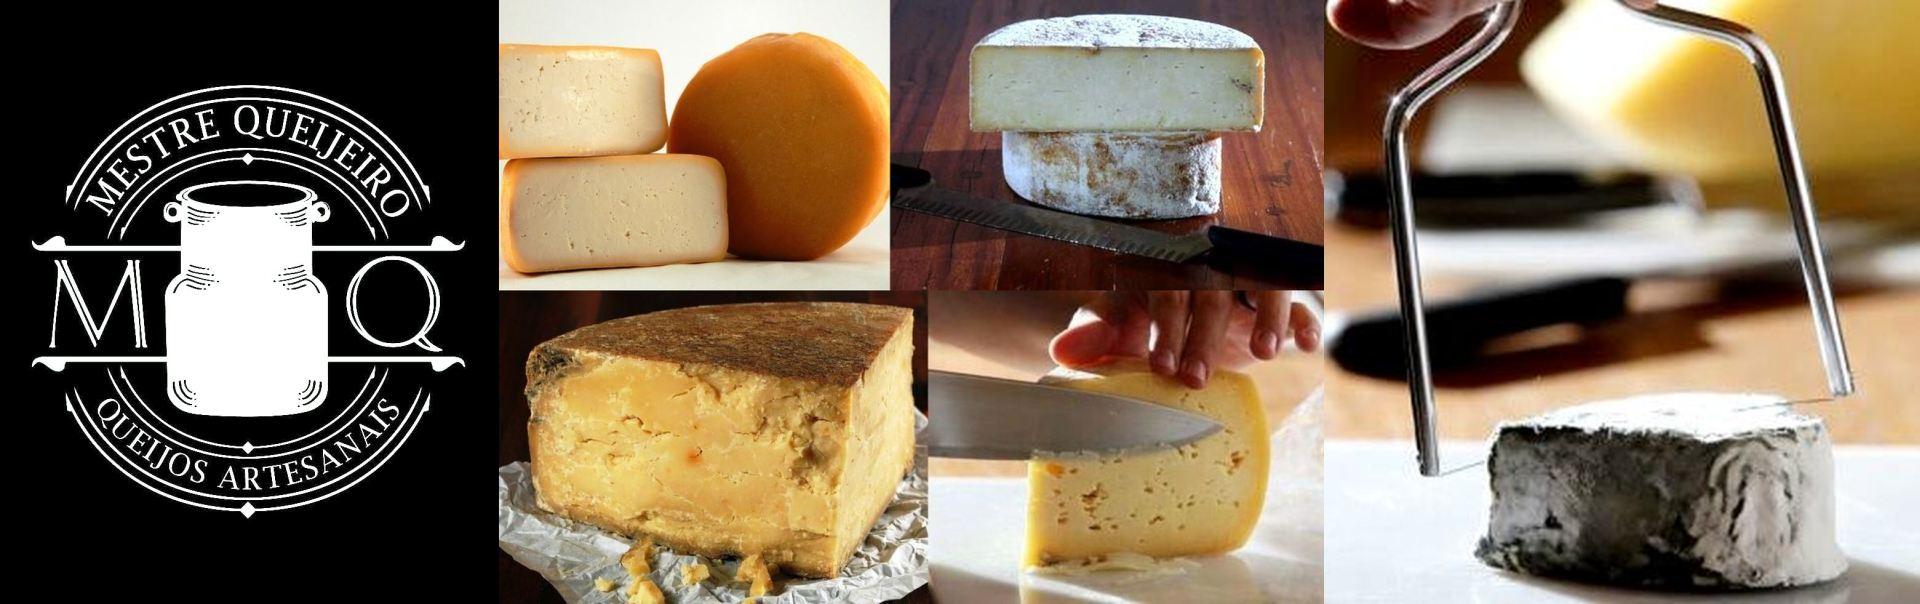 Mestre queijeiro clipboard